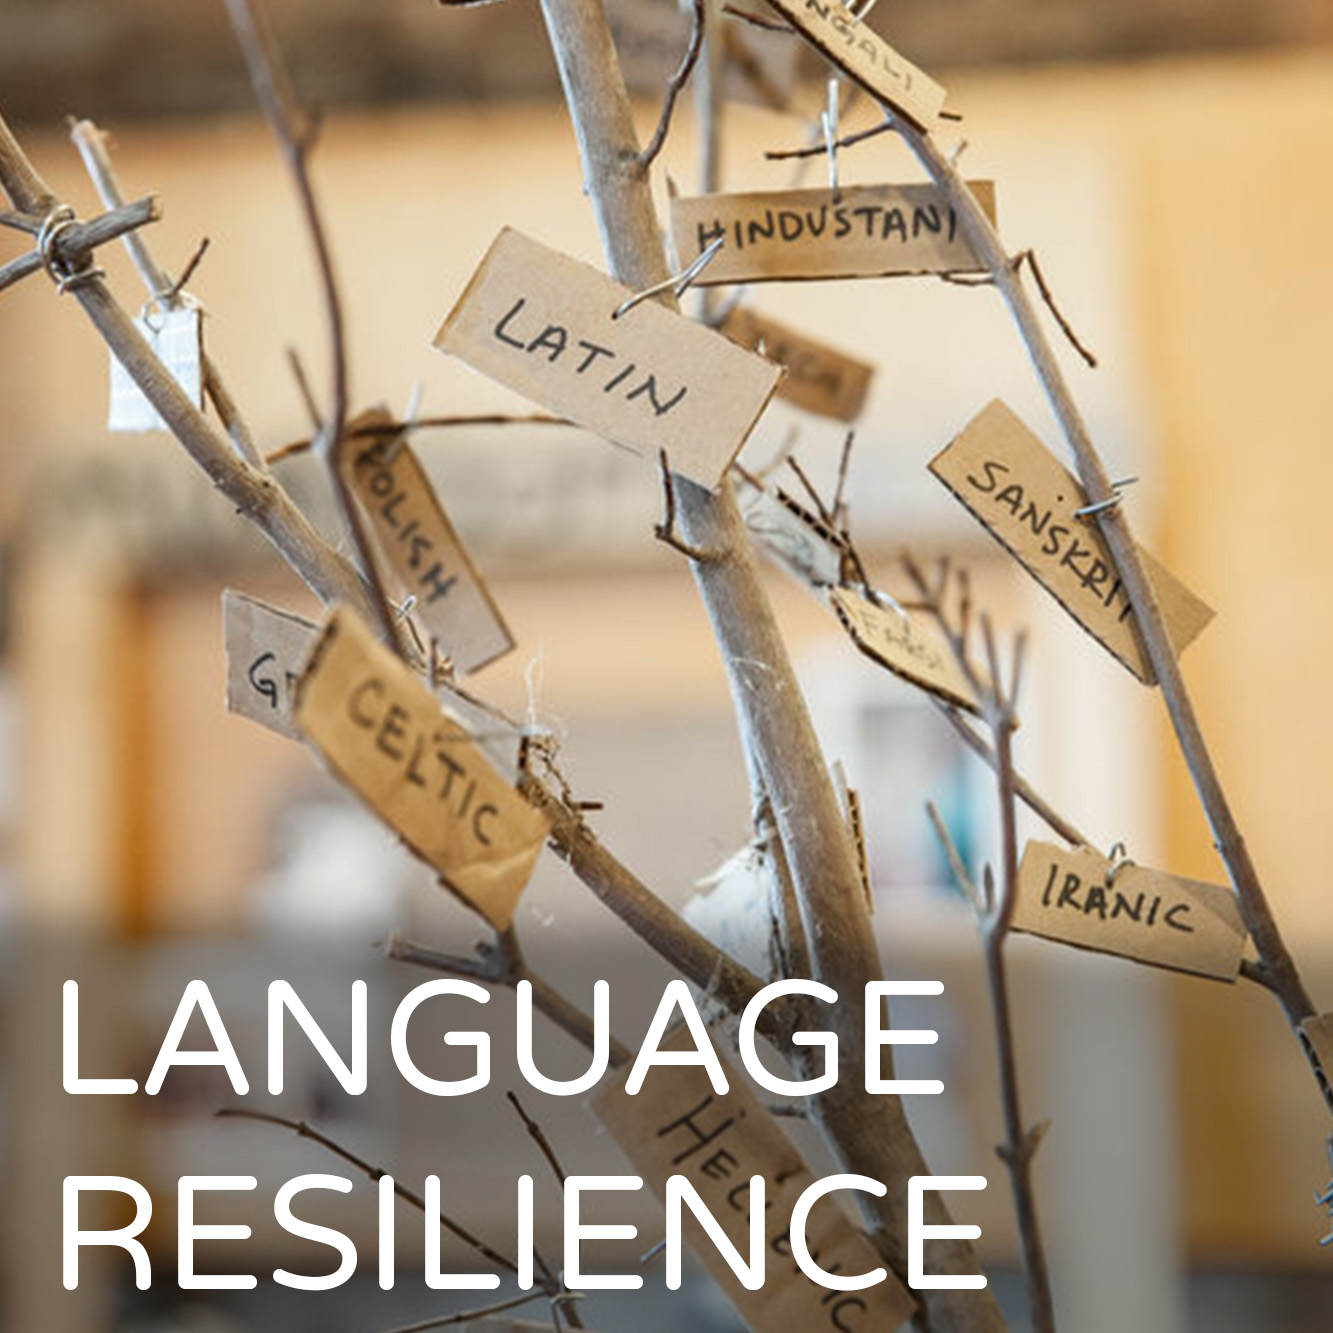 LanguageResilience2.jpg